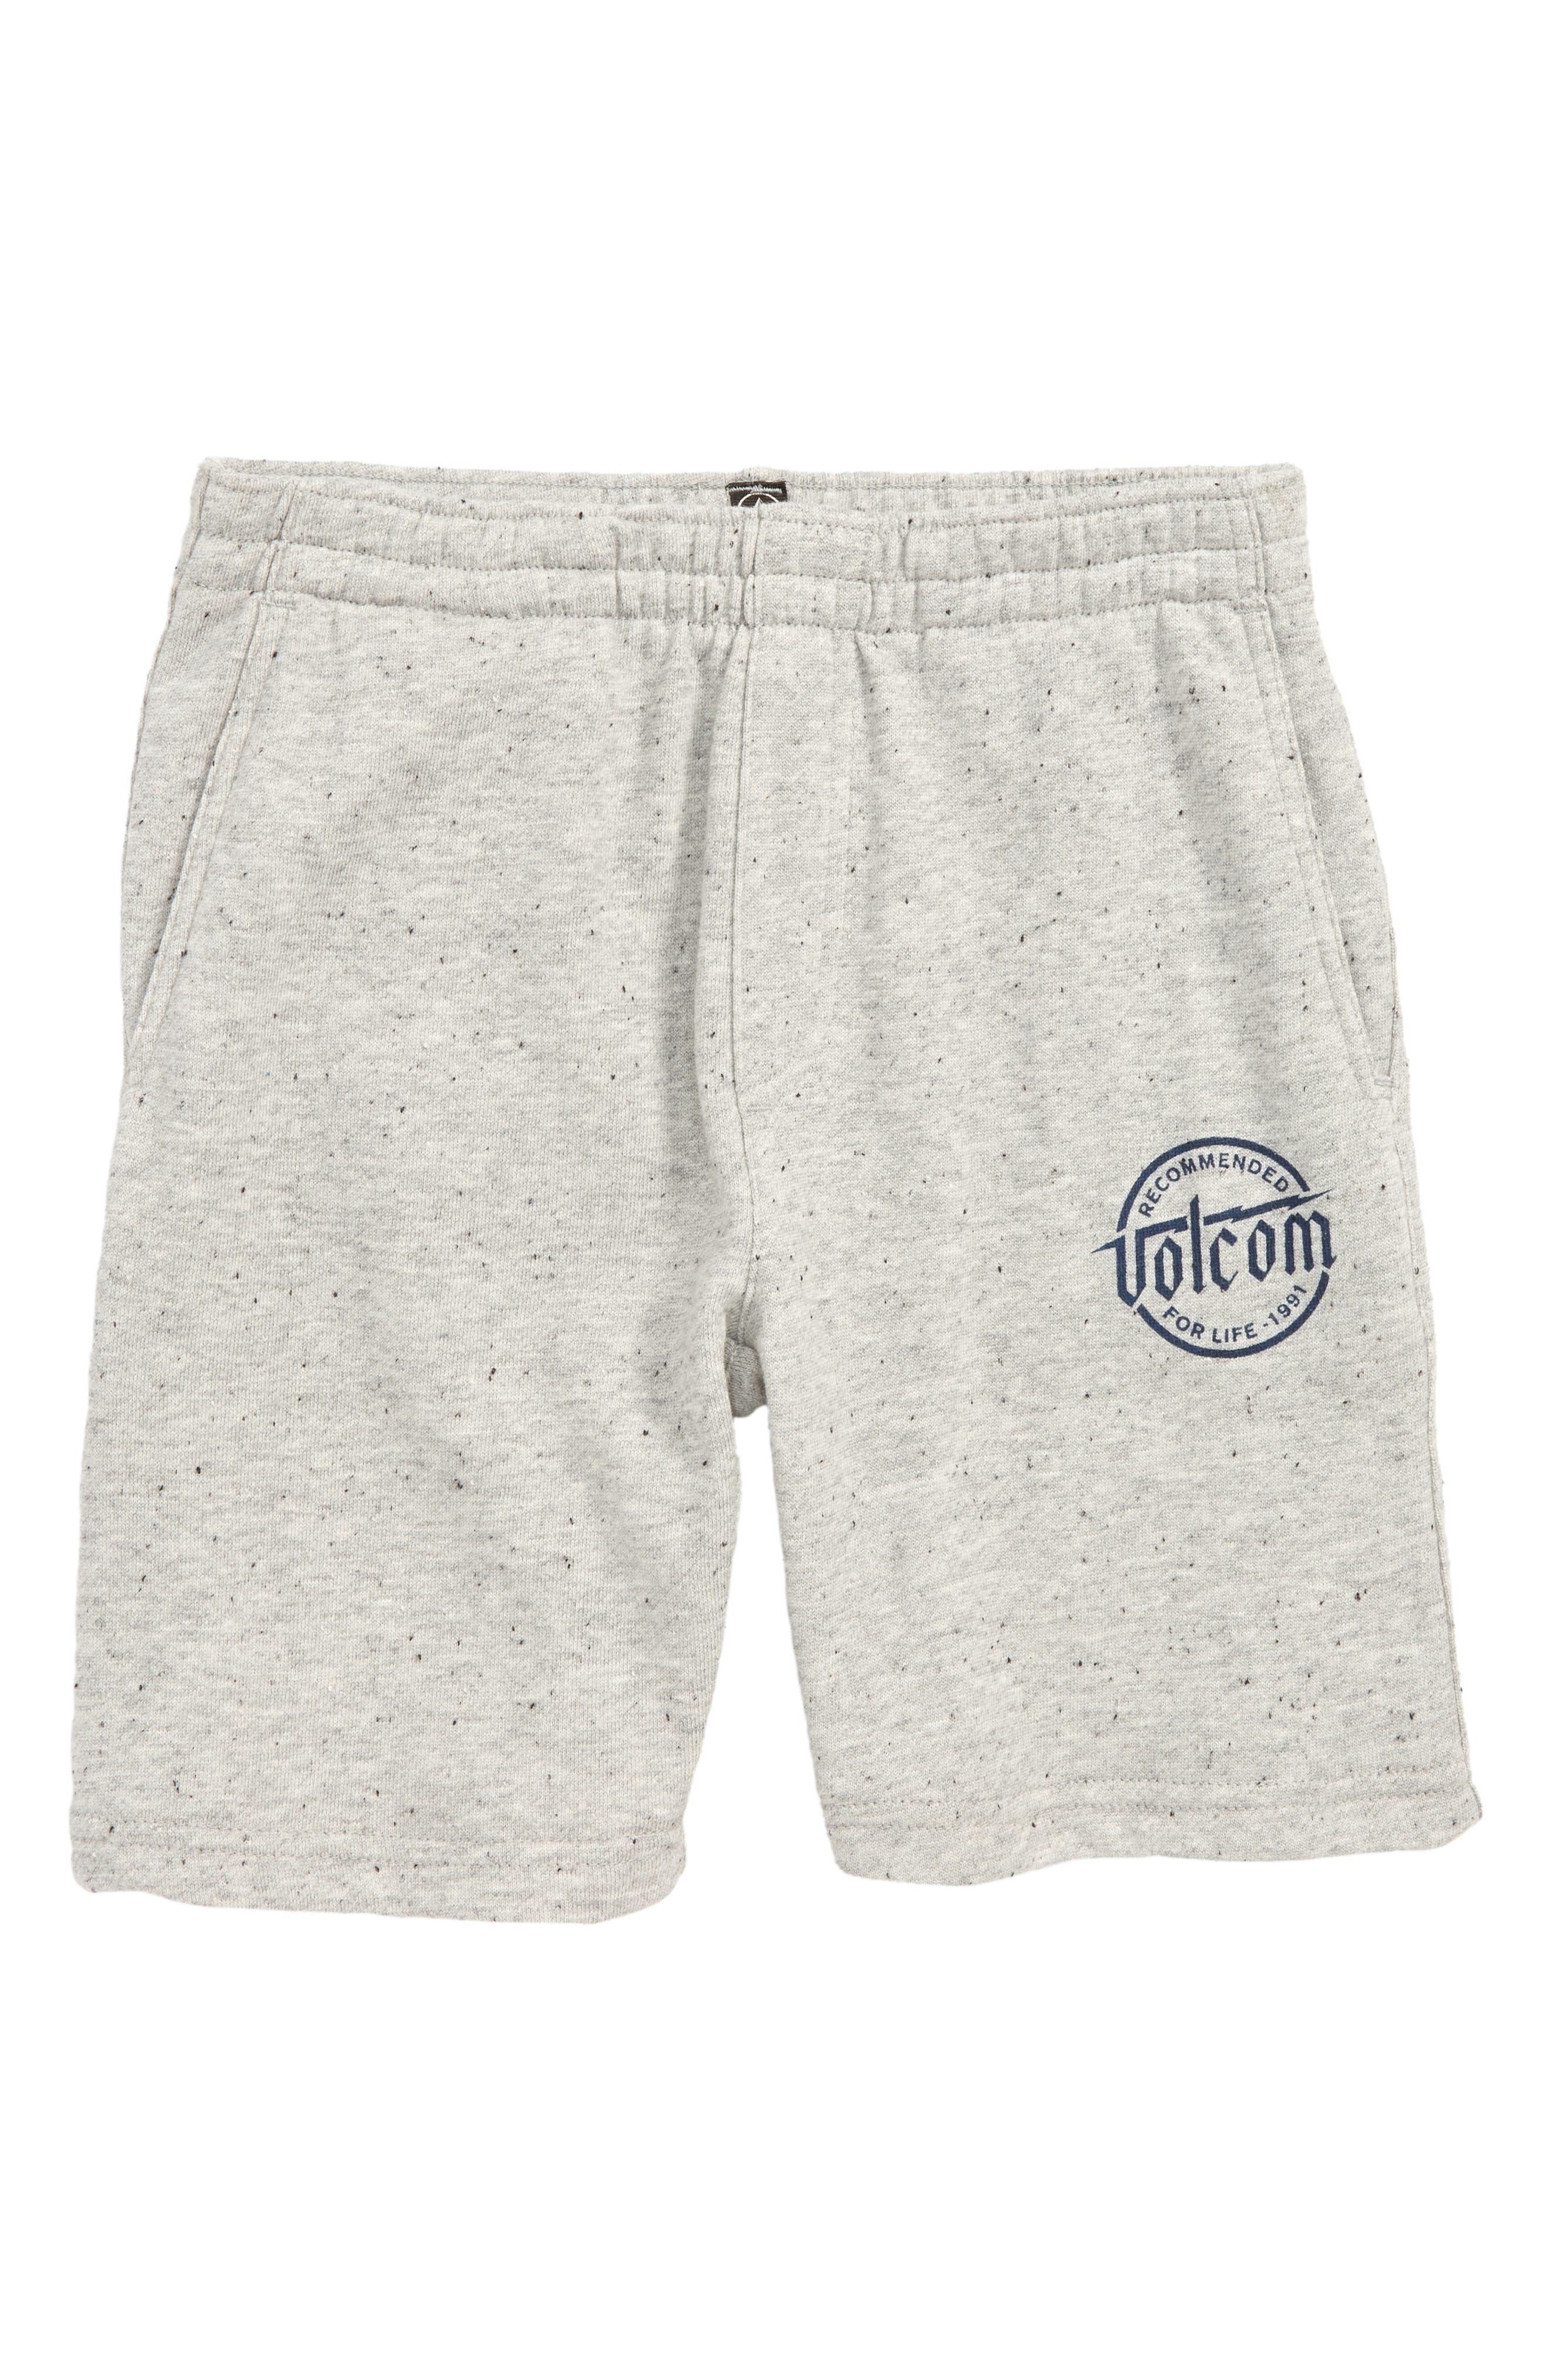 Downtime Sweat Shorts,                             Main thumbnail 1, color,                             020